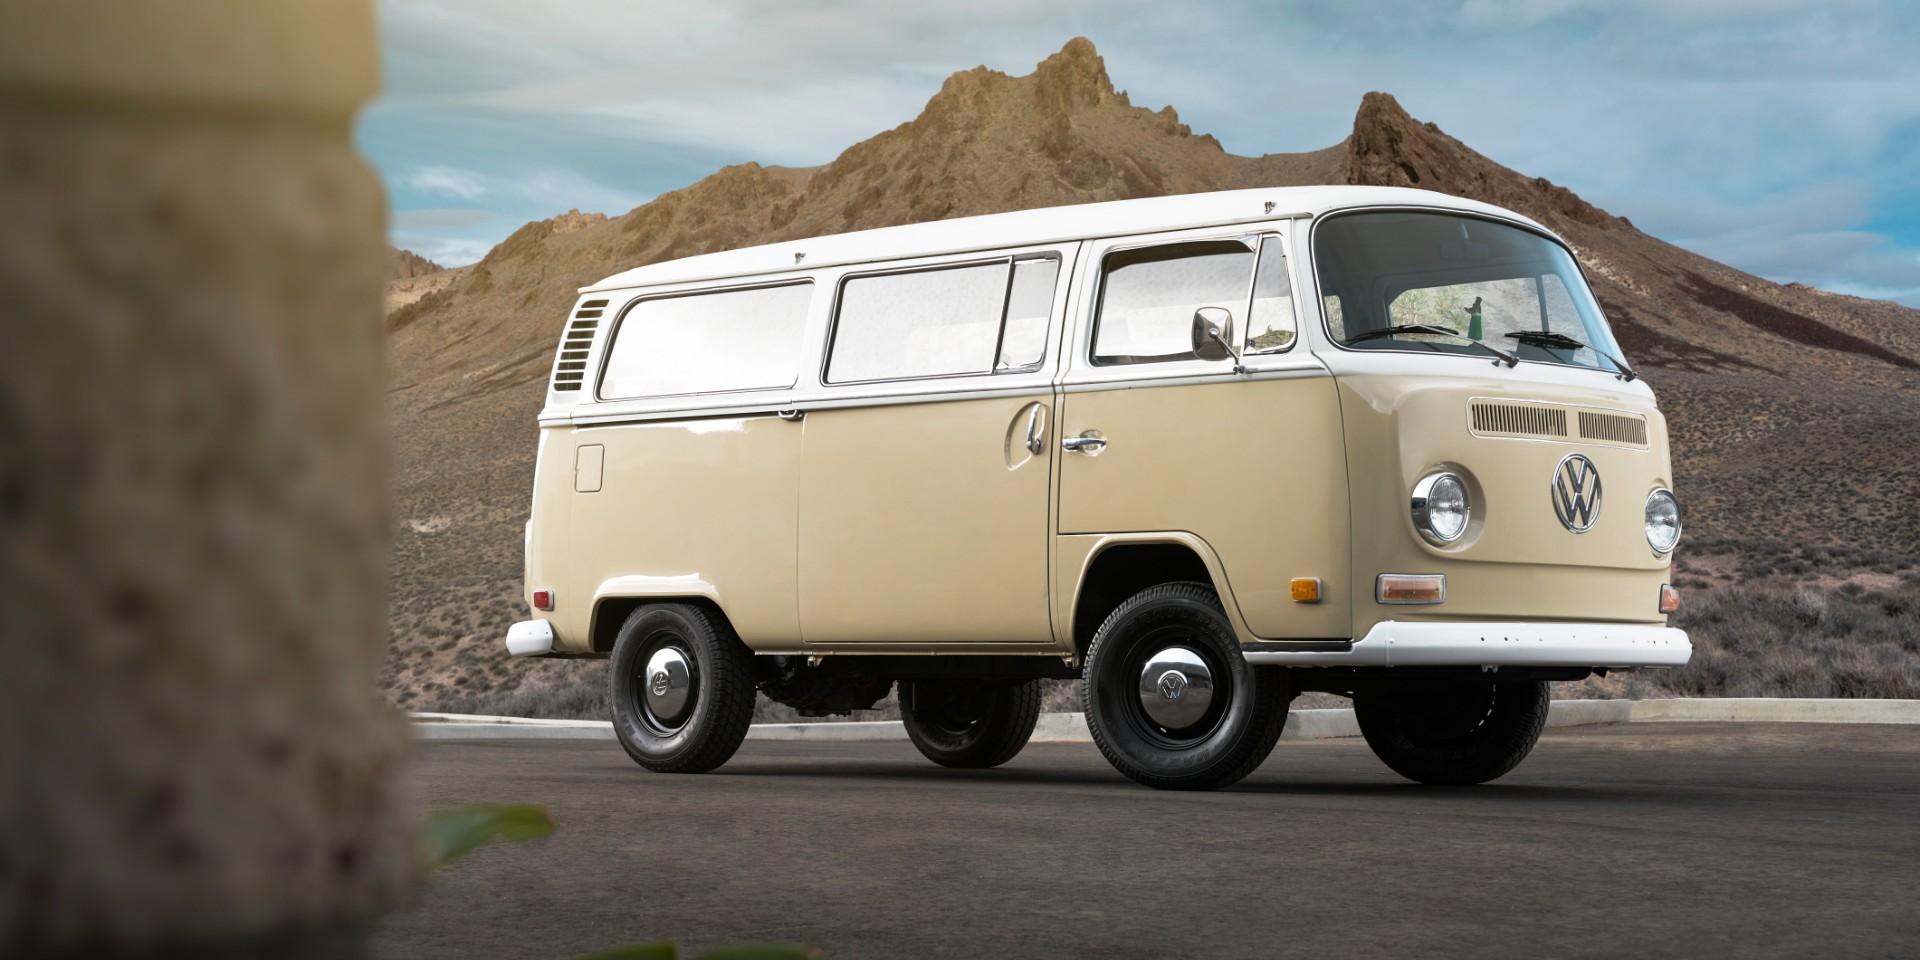 Klassiker umgerüstet: VW Bulli mit e-Golf-Genen